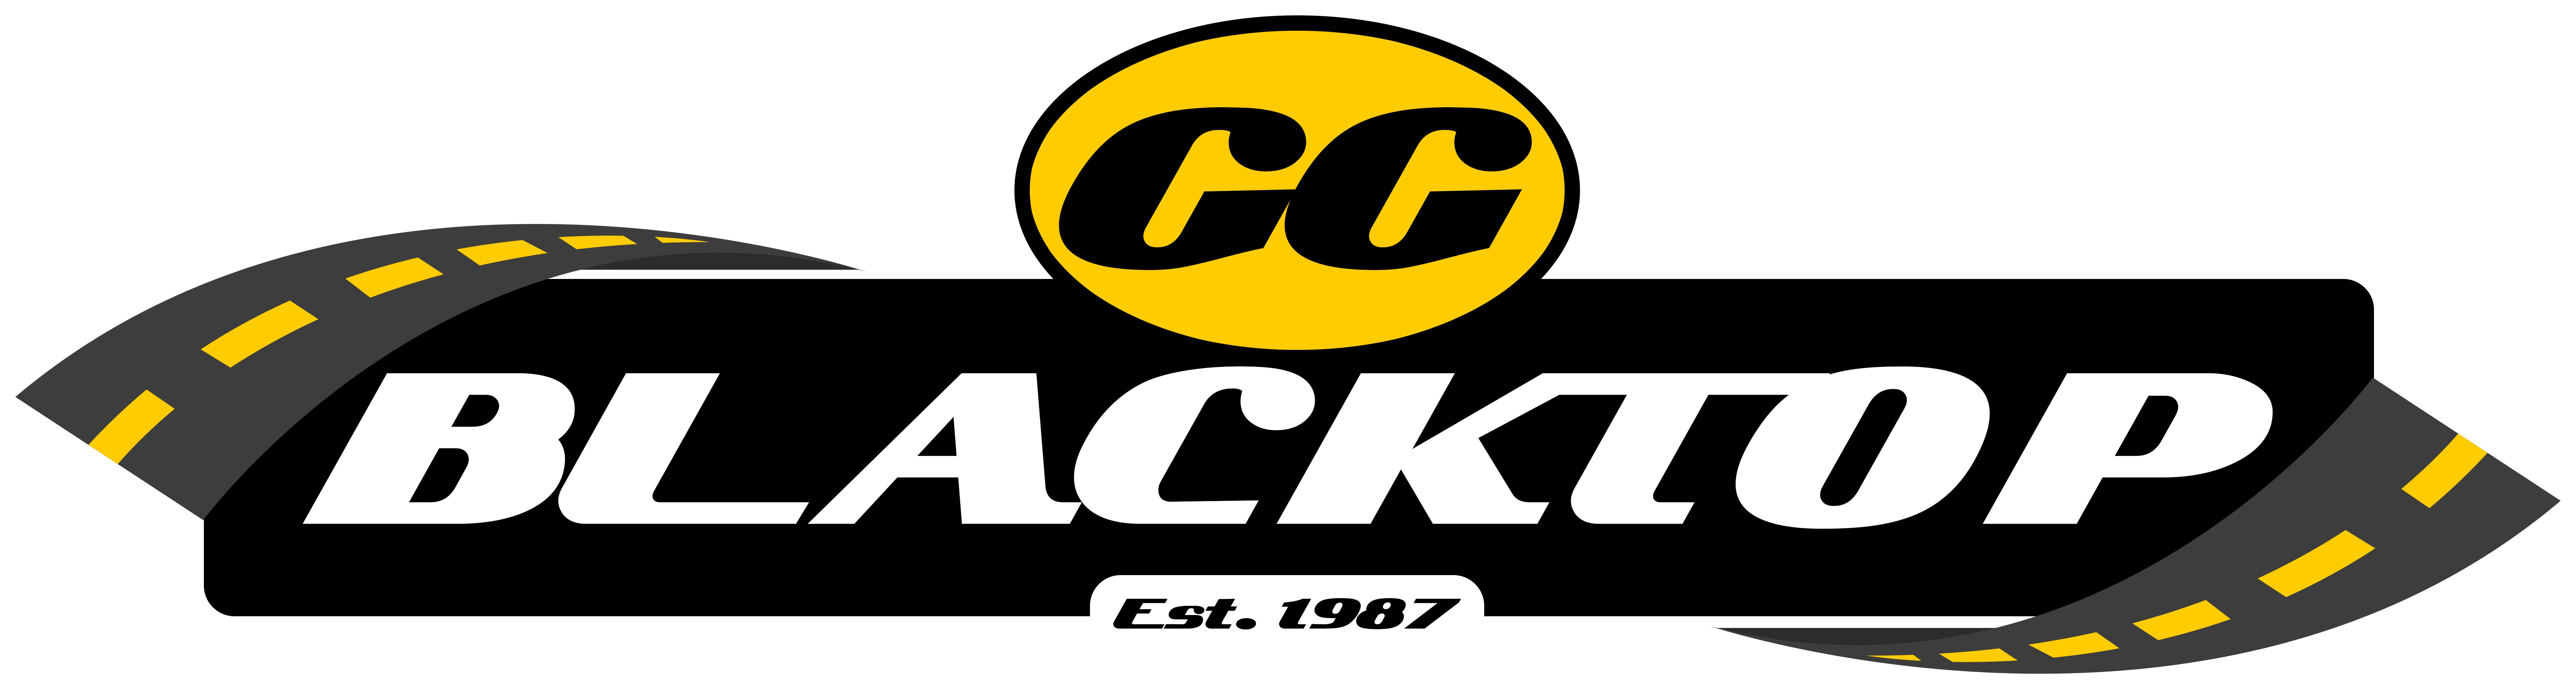 GG Blacktop Ltd.